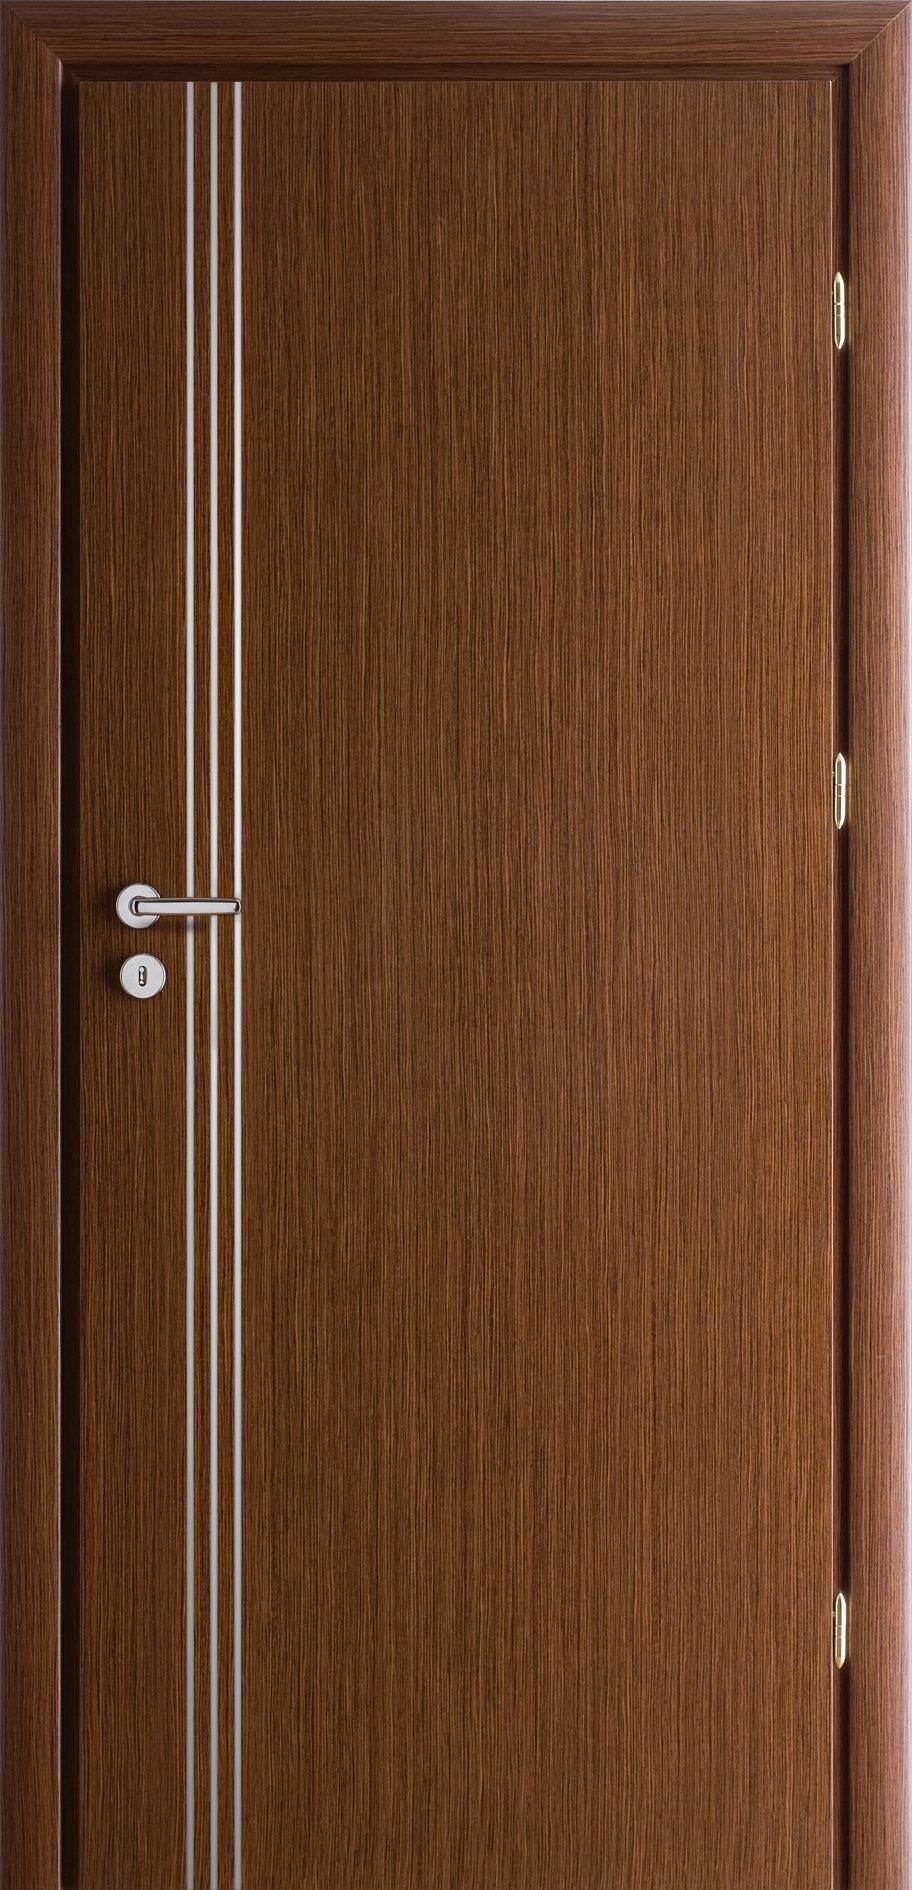 Dvere Porta Line, model B.1